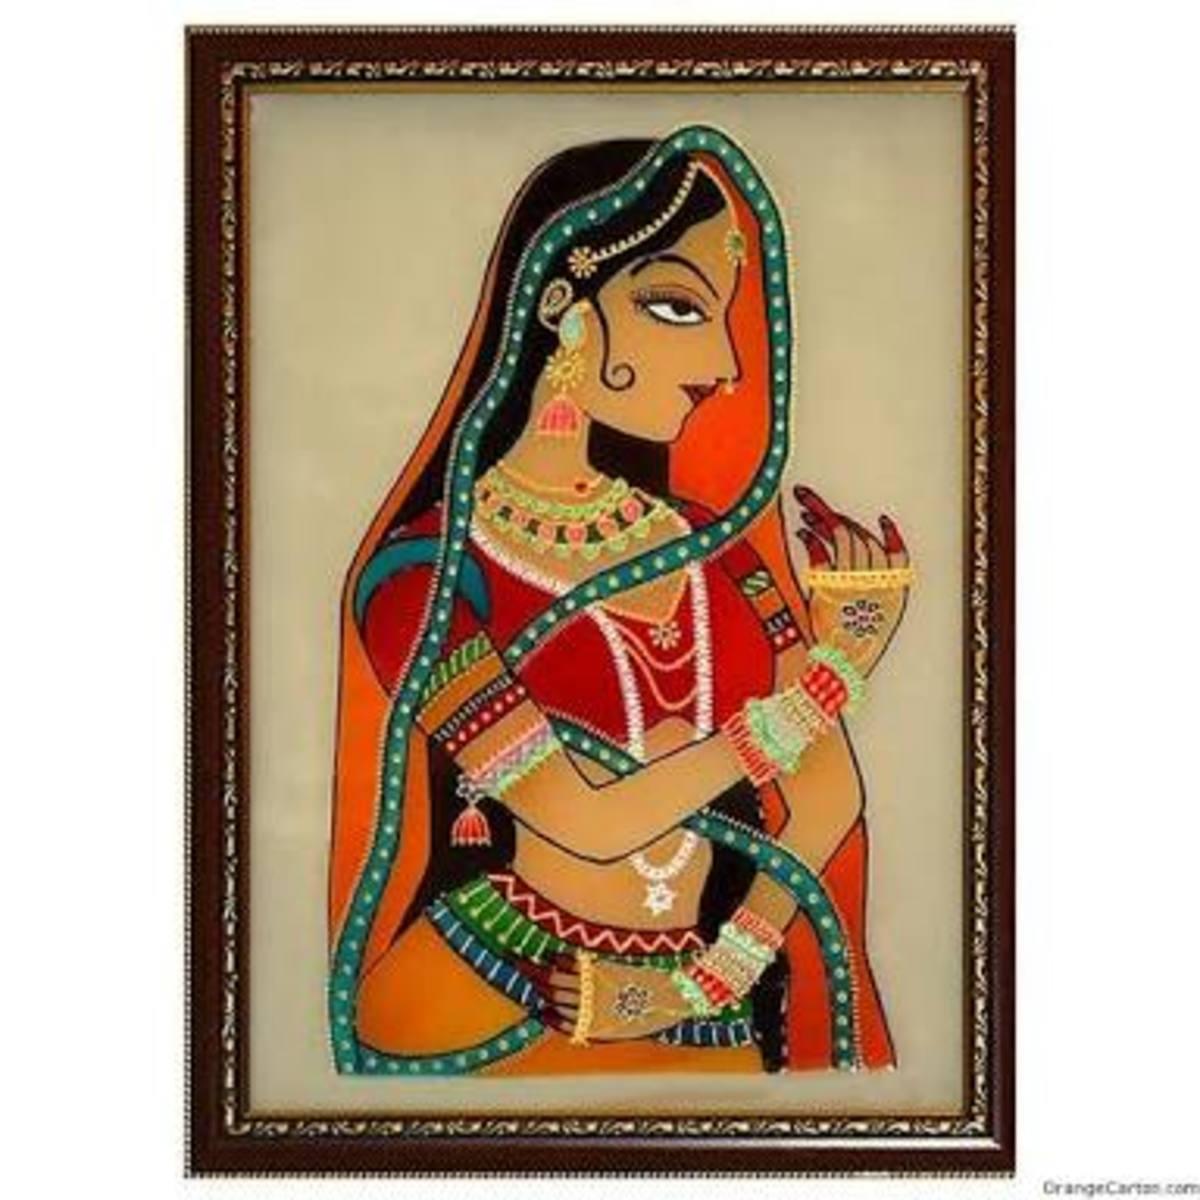 Madhubani painting showing a princess